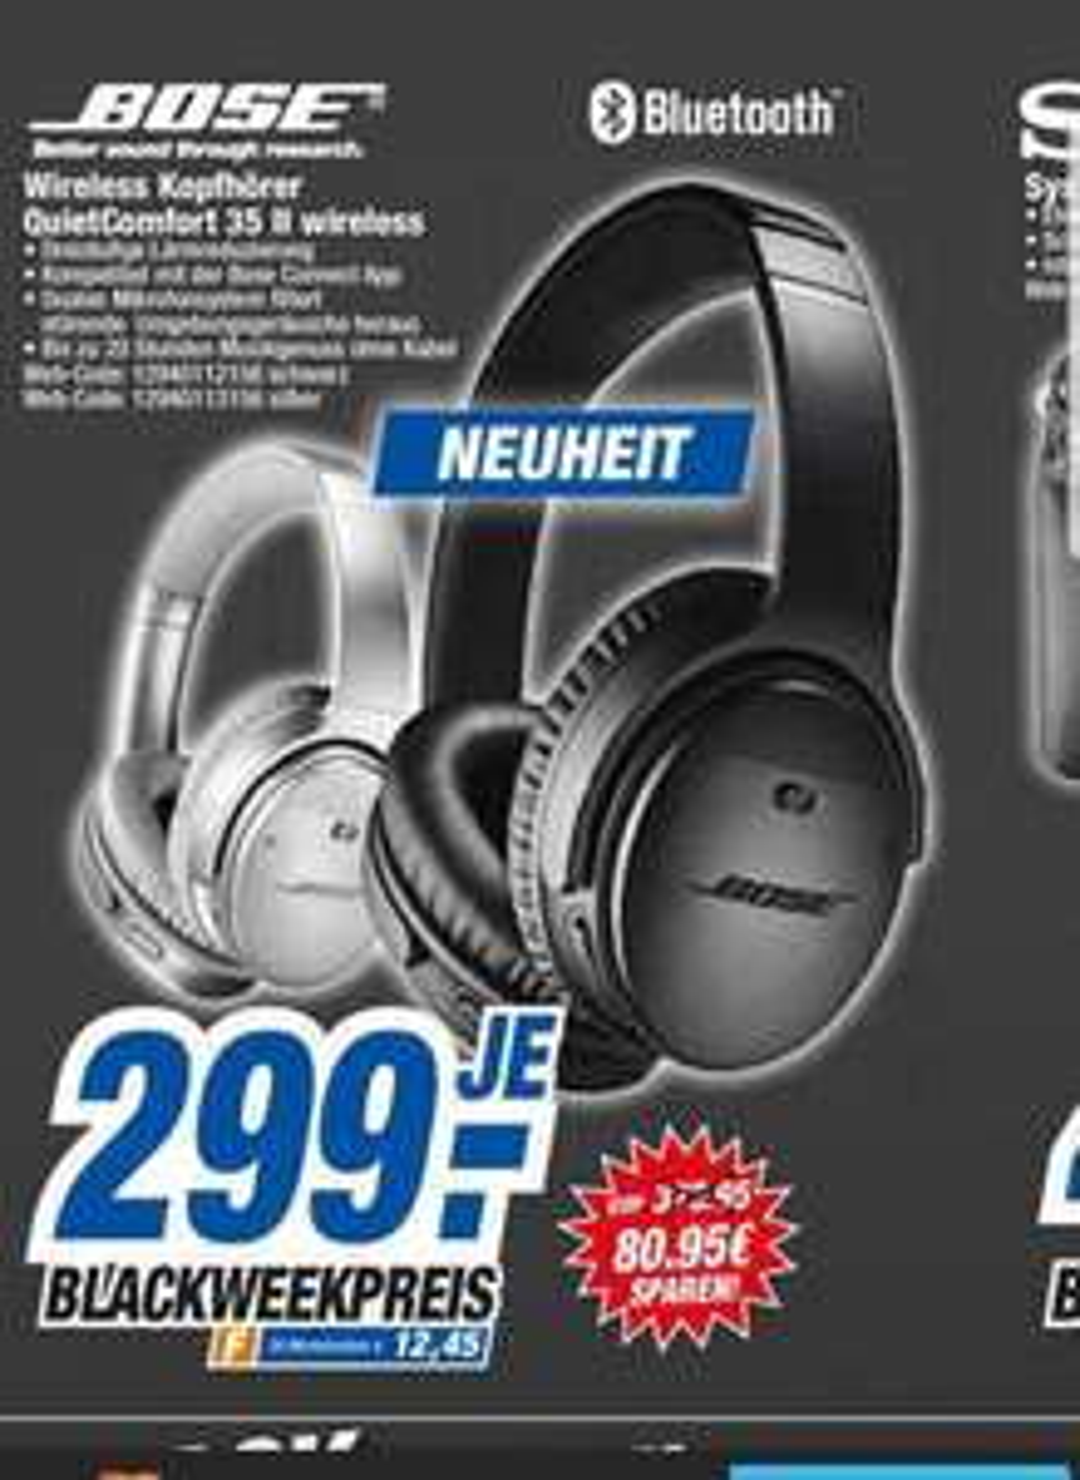 HEM Expert Baden-Württemberg Bose  quitecomfort 35 II Gen. für 299€